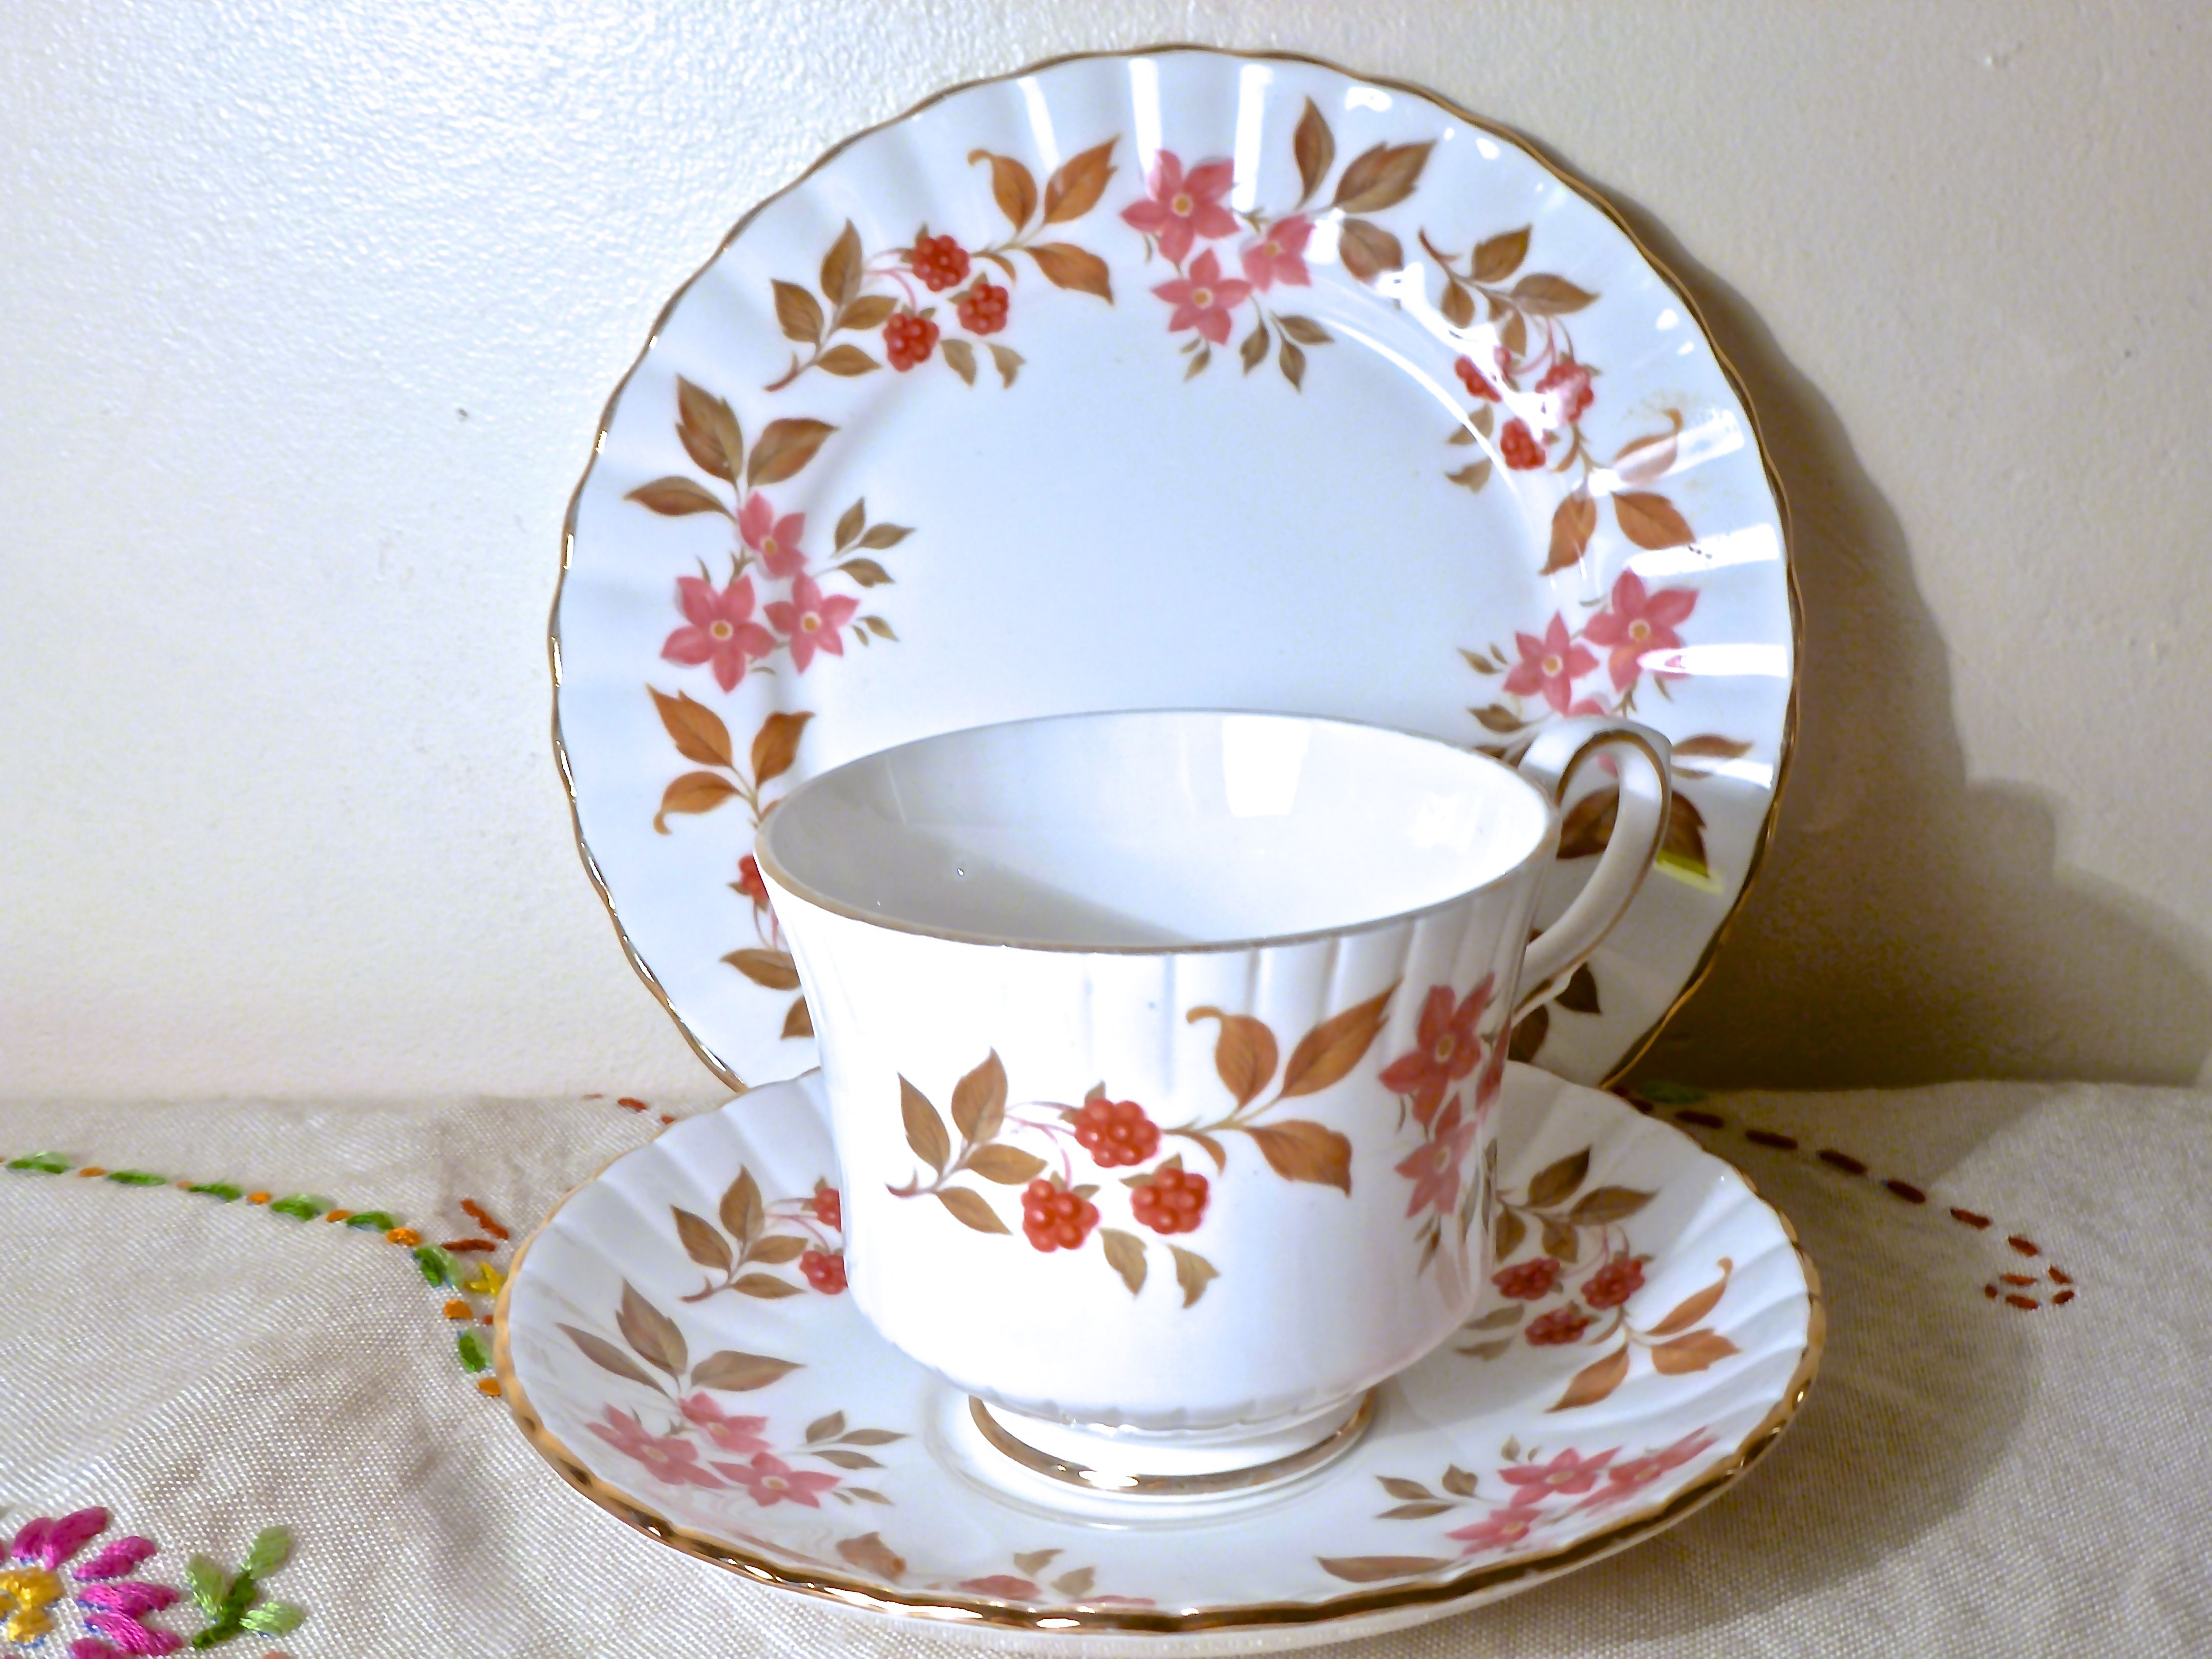 Royal Stafford Fragrance English Bone China Trio Tea Set 11 00 Https